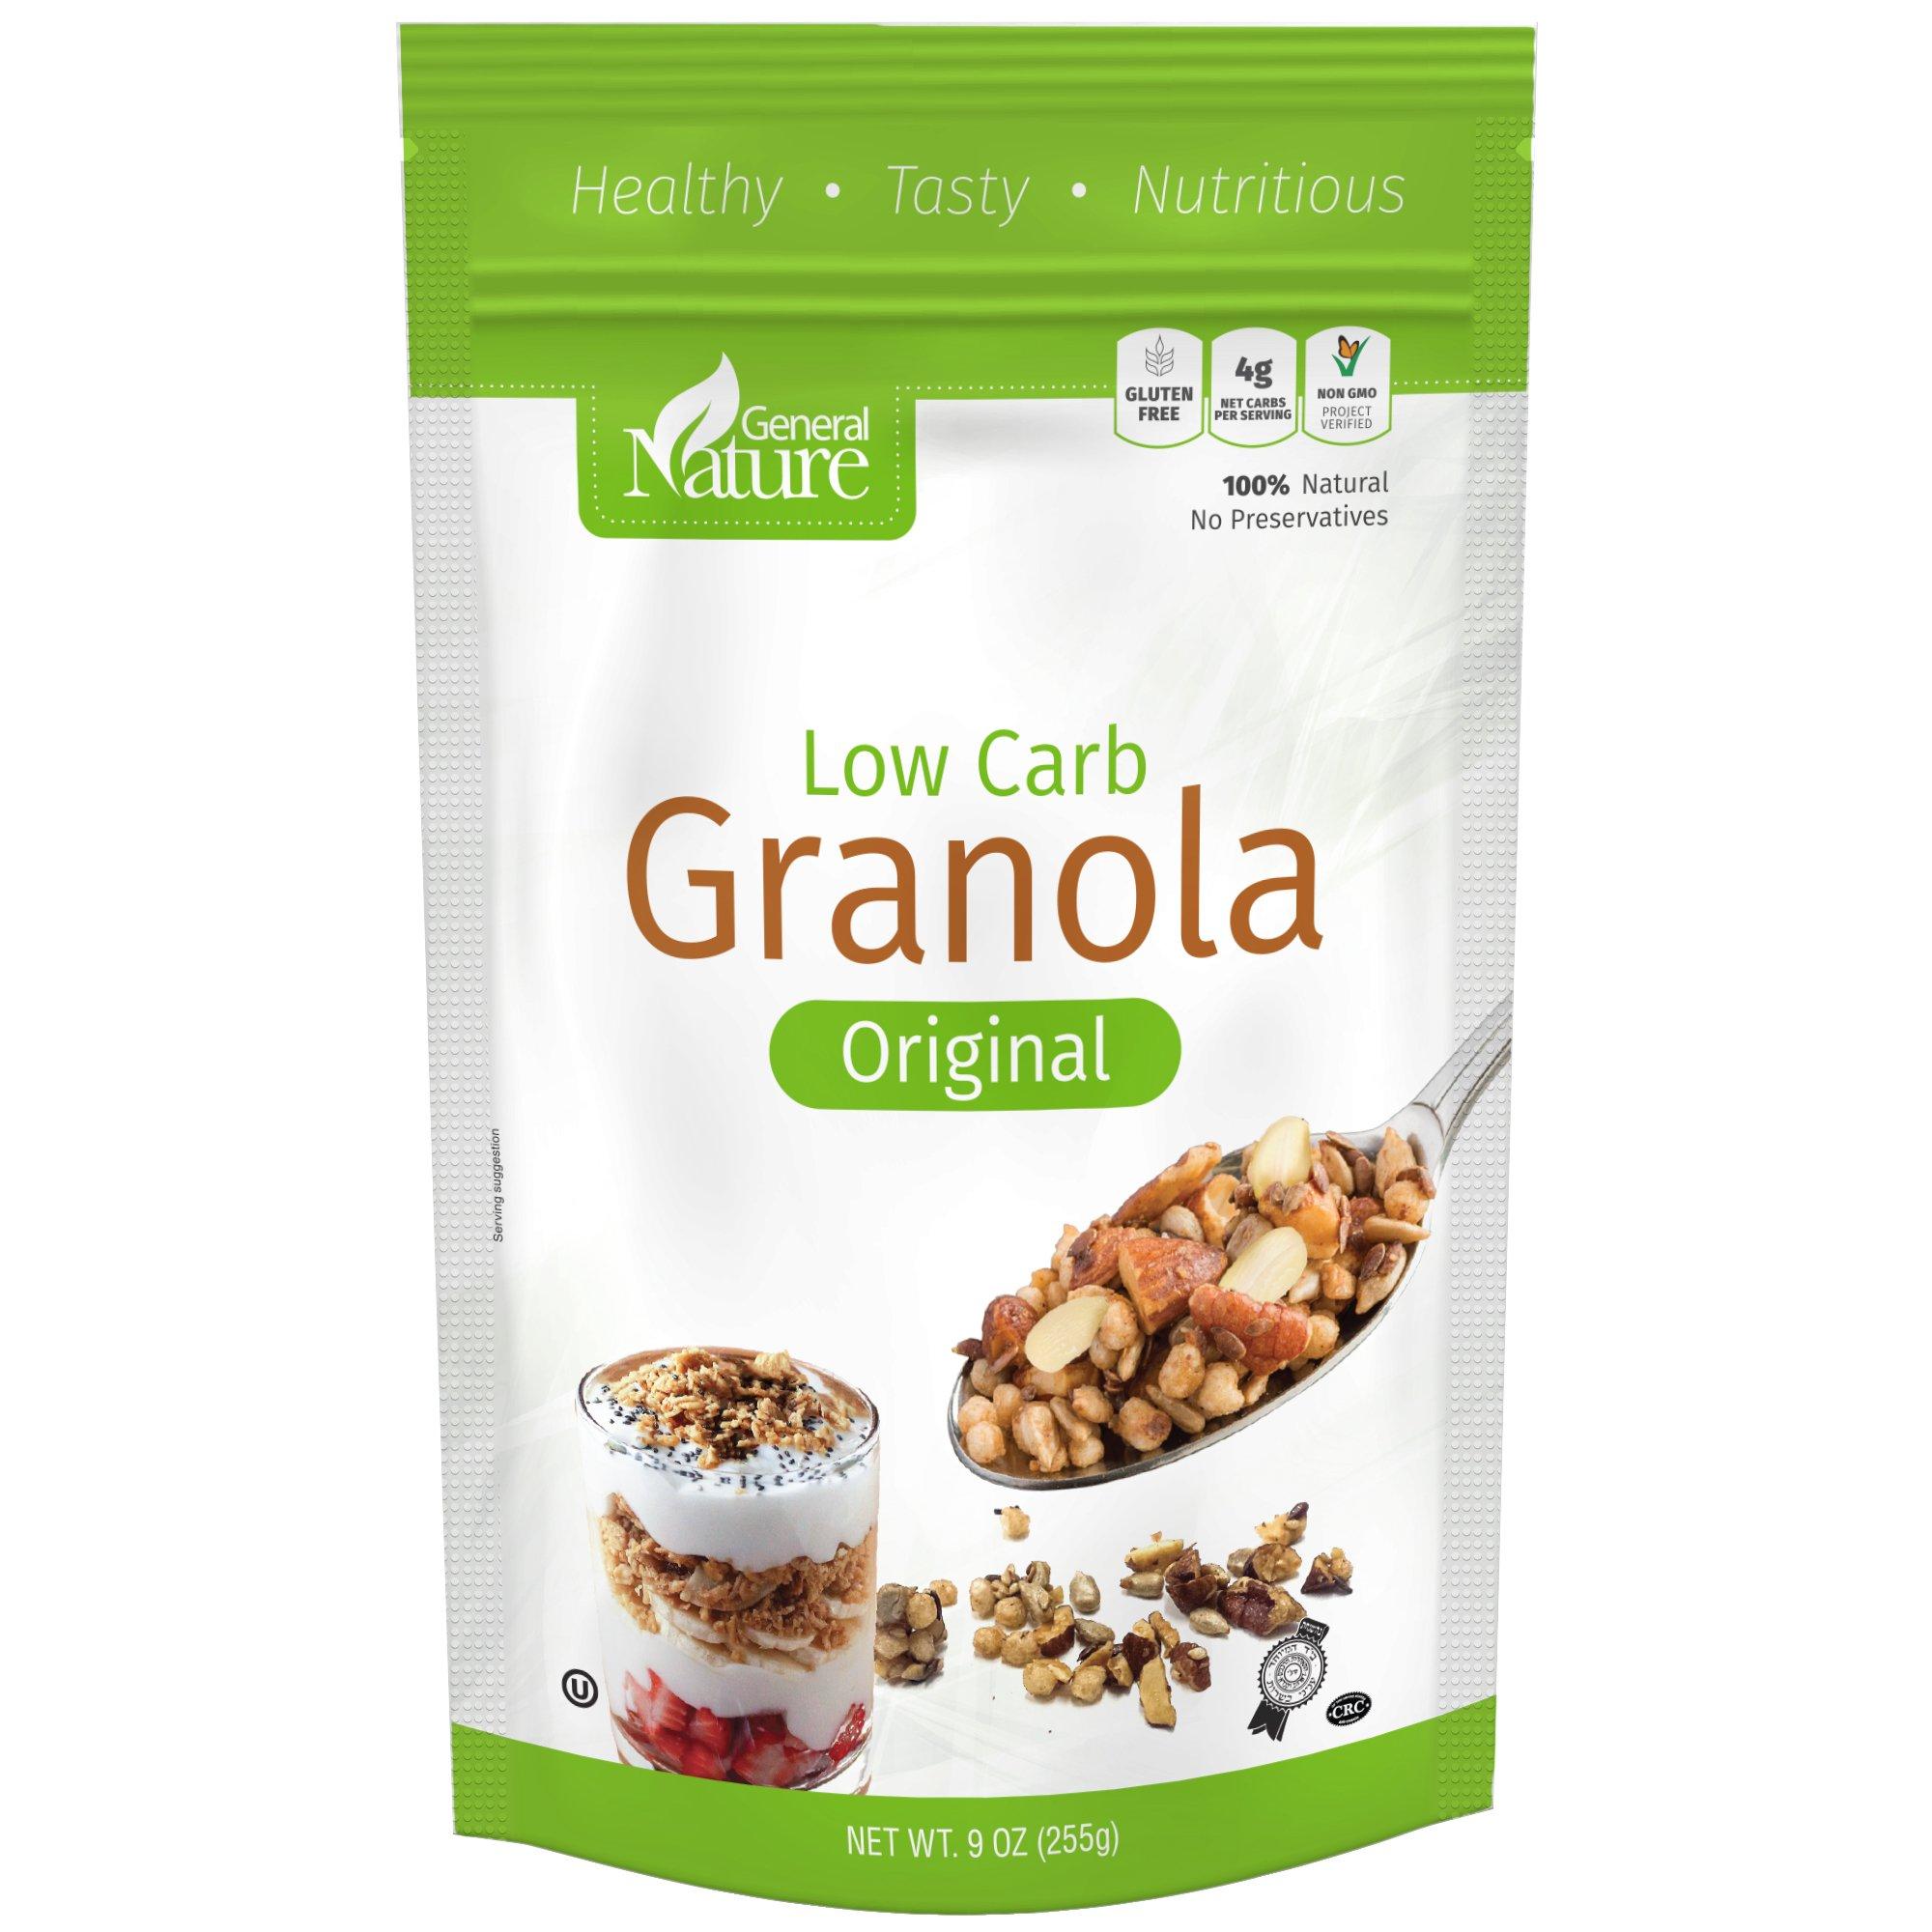 Low Carb Granola Cereal, Gluten Free, Sugar Free, 4g Net Carbs, No Sugar Added, Non-GMO, No Artificial Sweeteners, %100 Natural, No Preservatives, Kosher